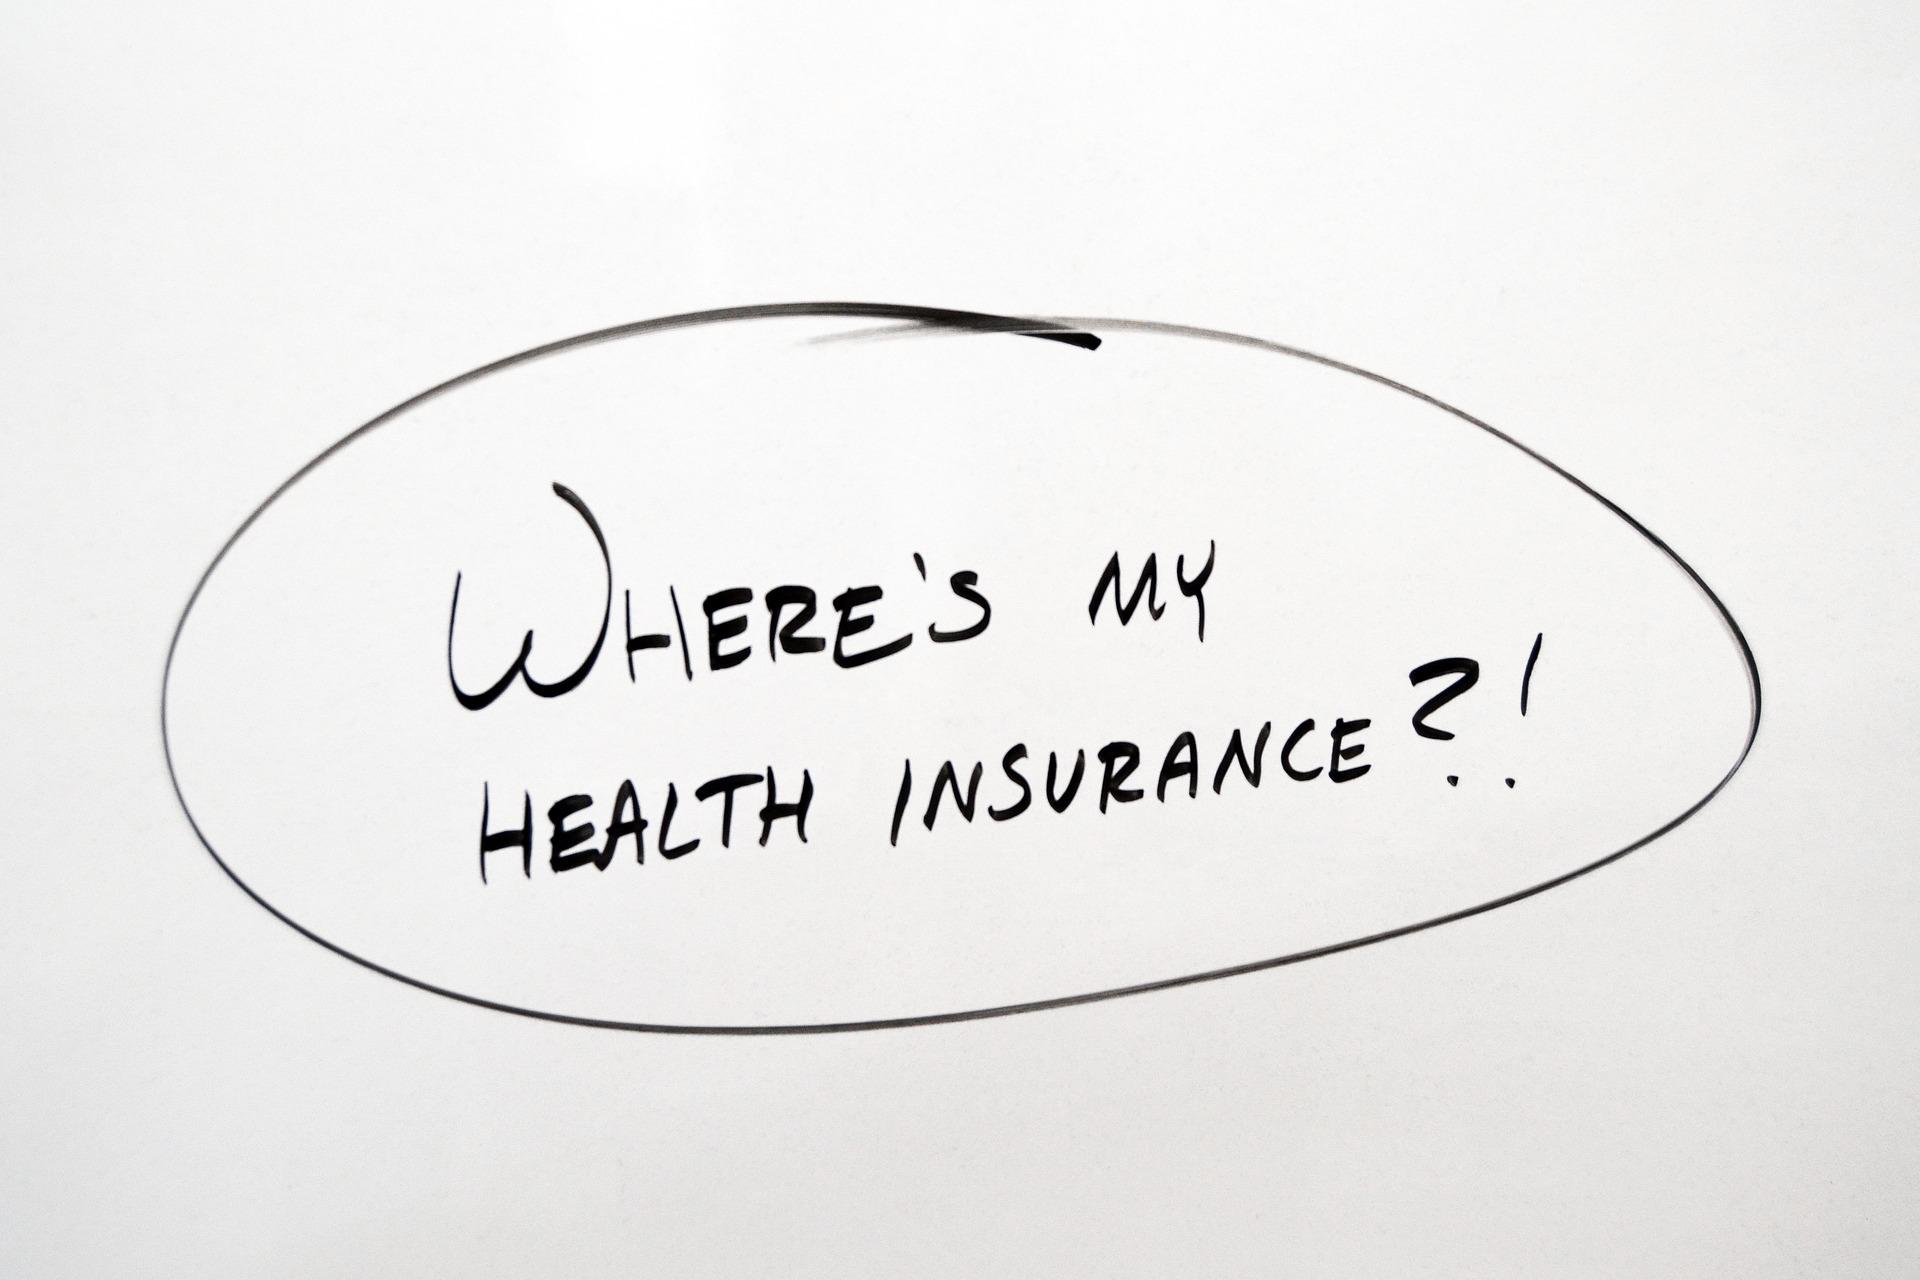 health-insurance-image